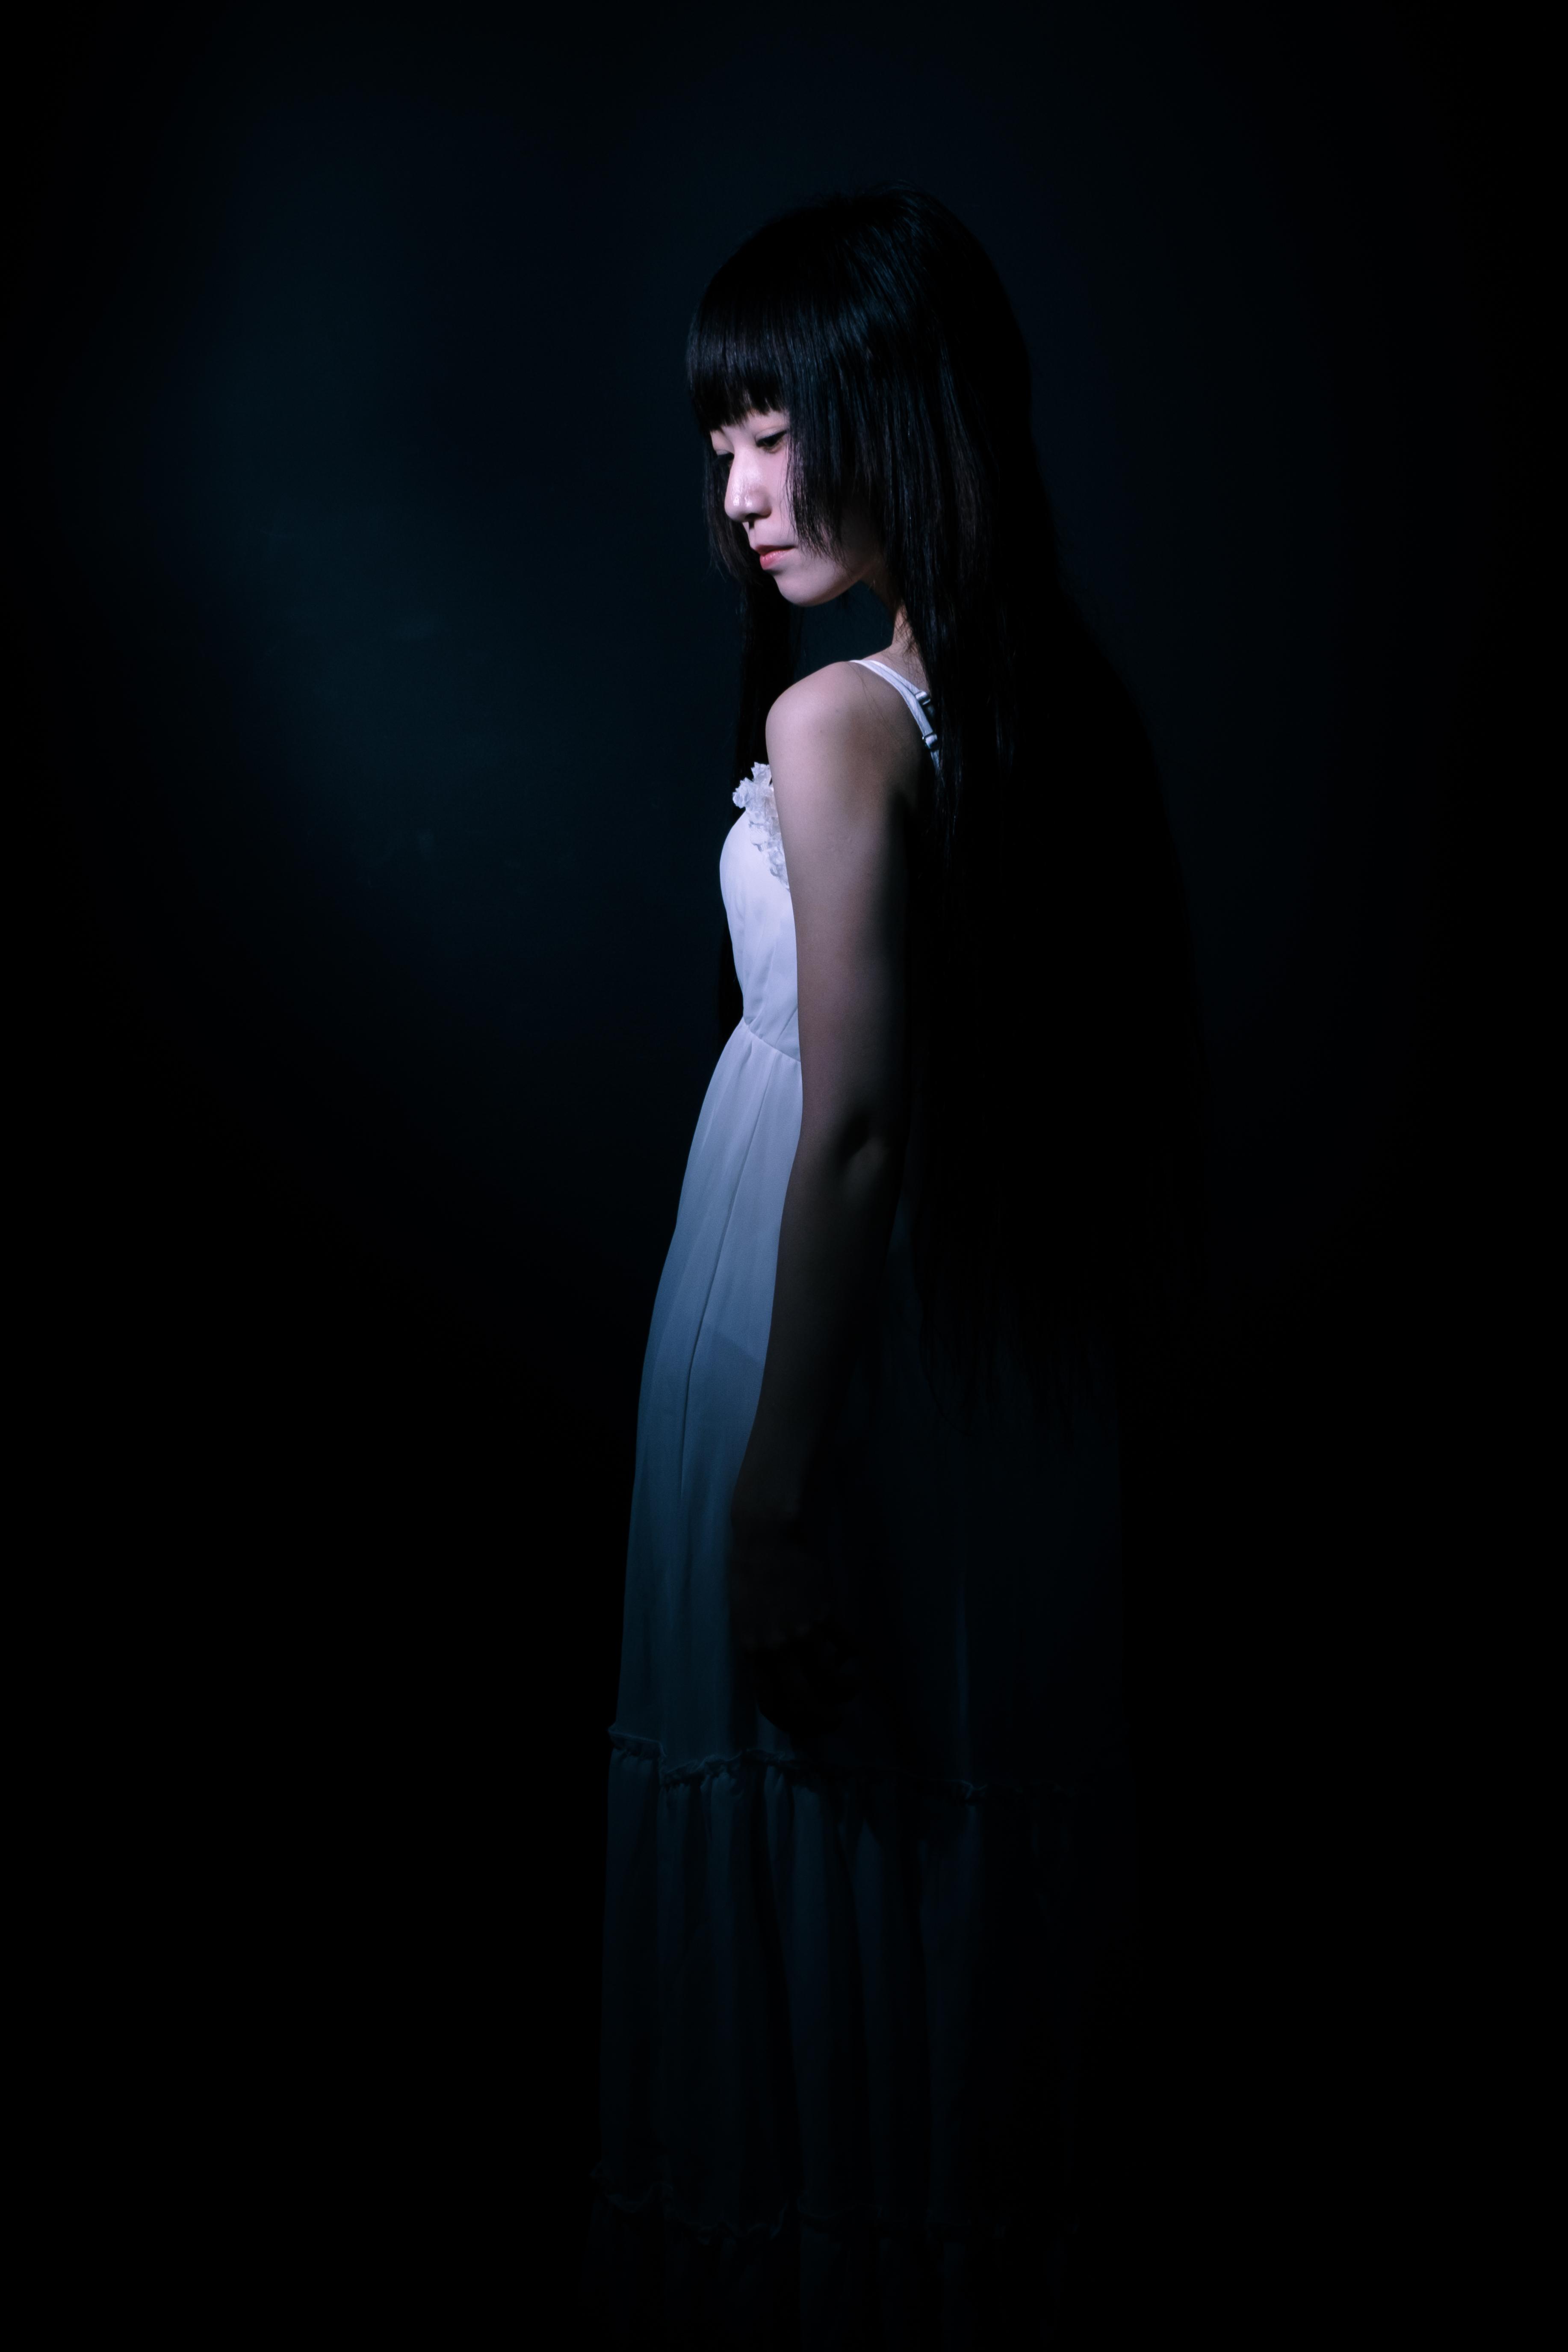 Model:緋真煉